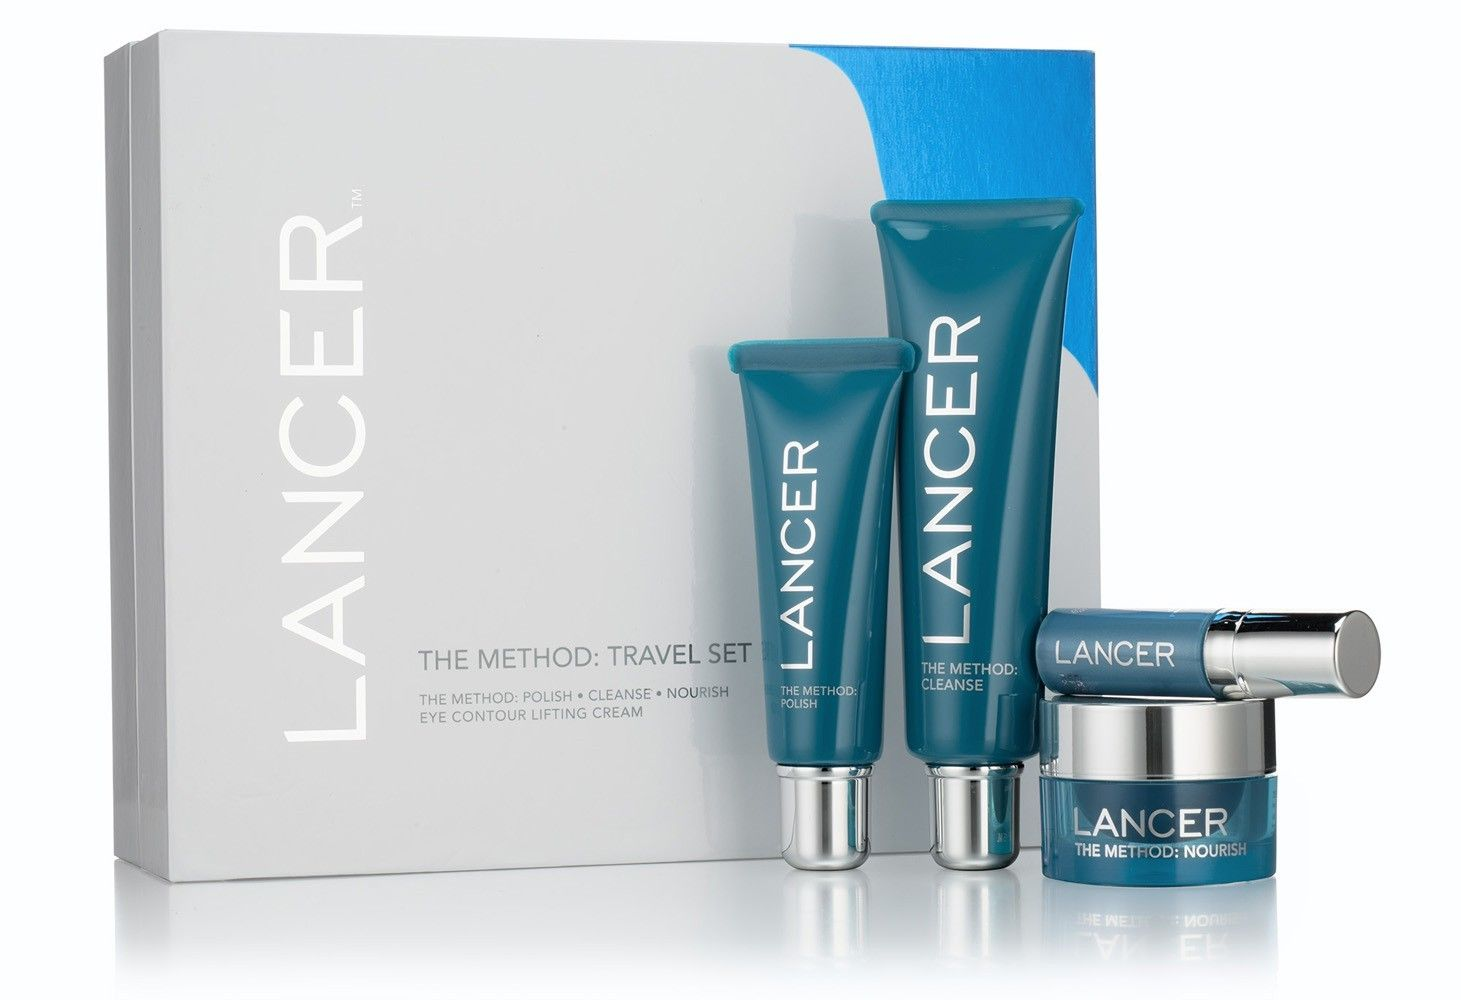 The Method Travel Set Skin Care Brands Coconut Oil Skin Care Skin Care List